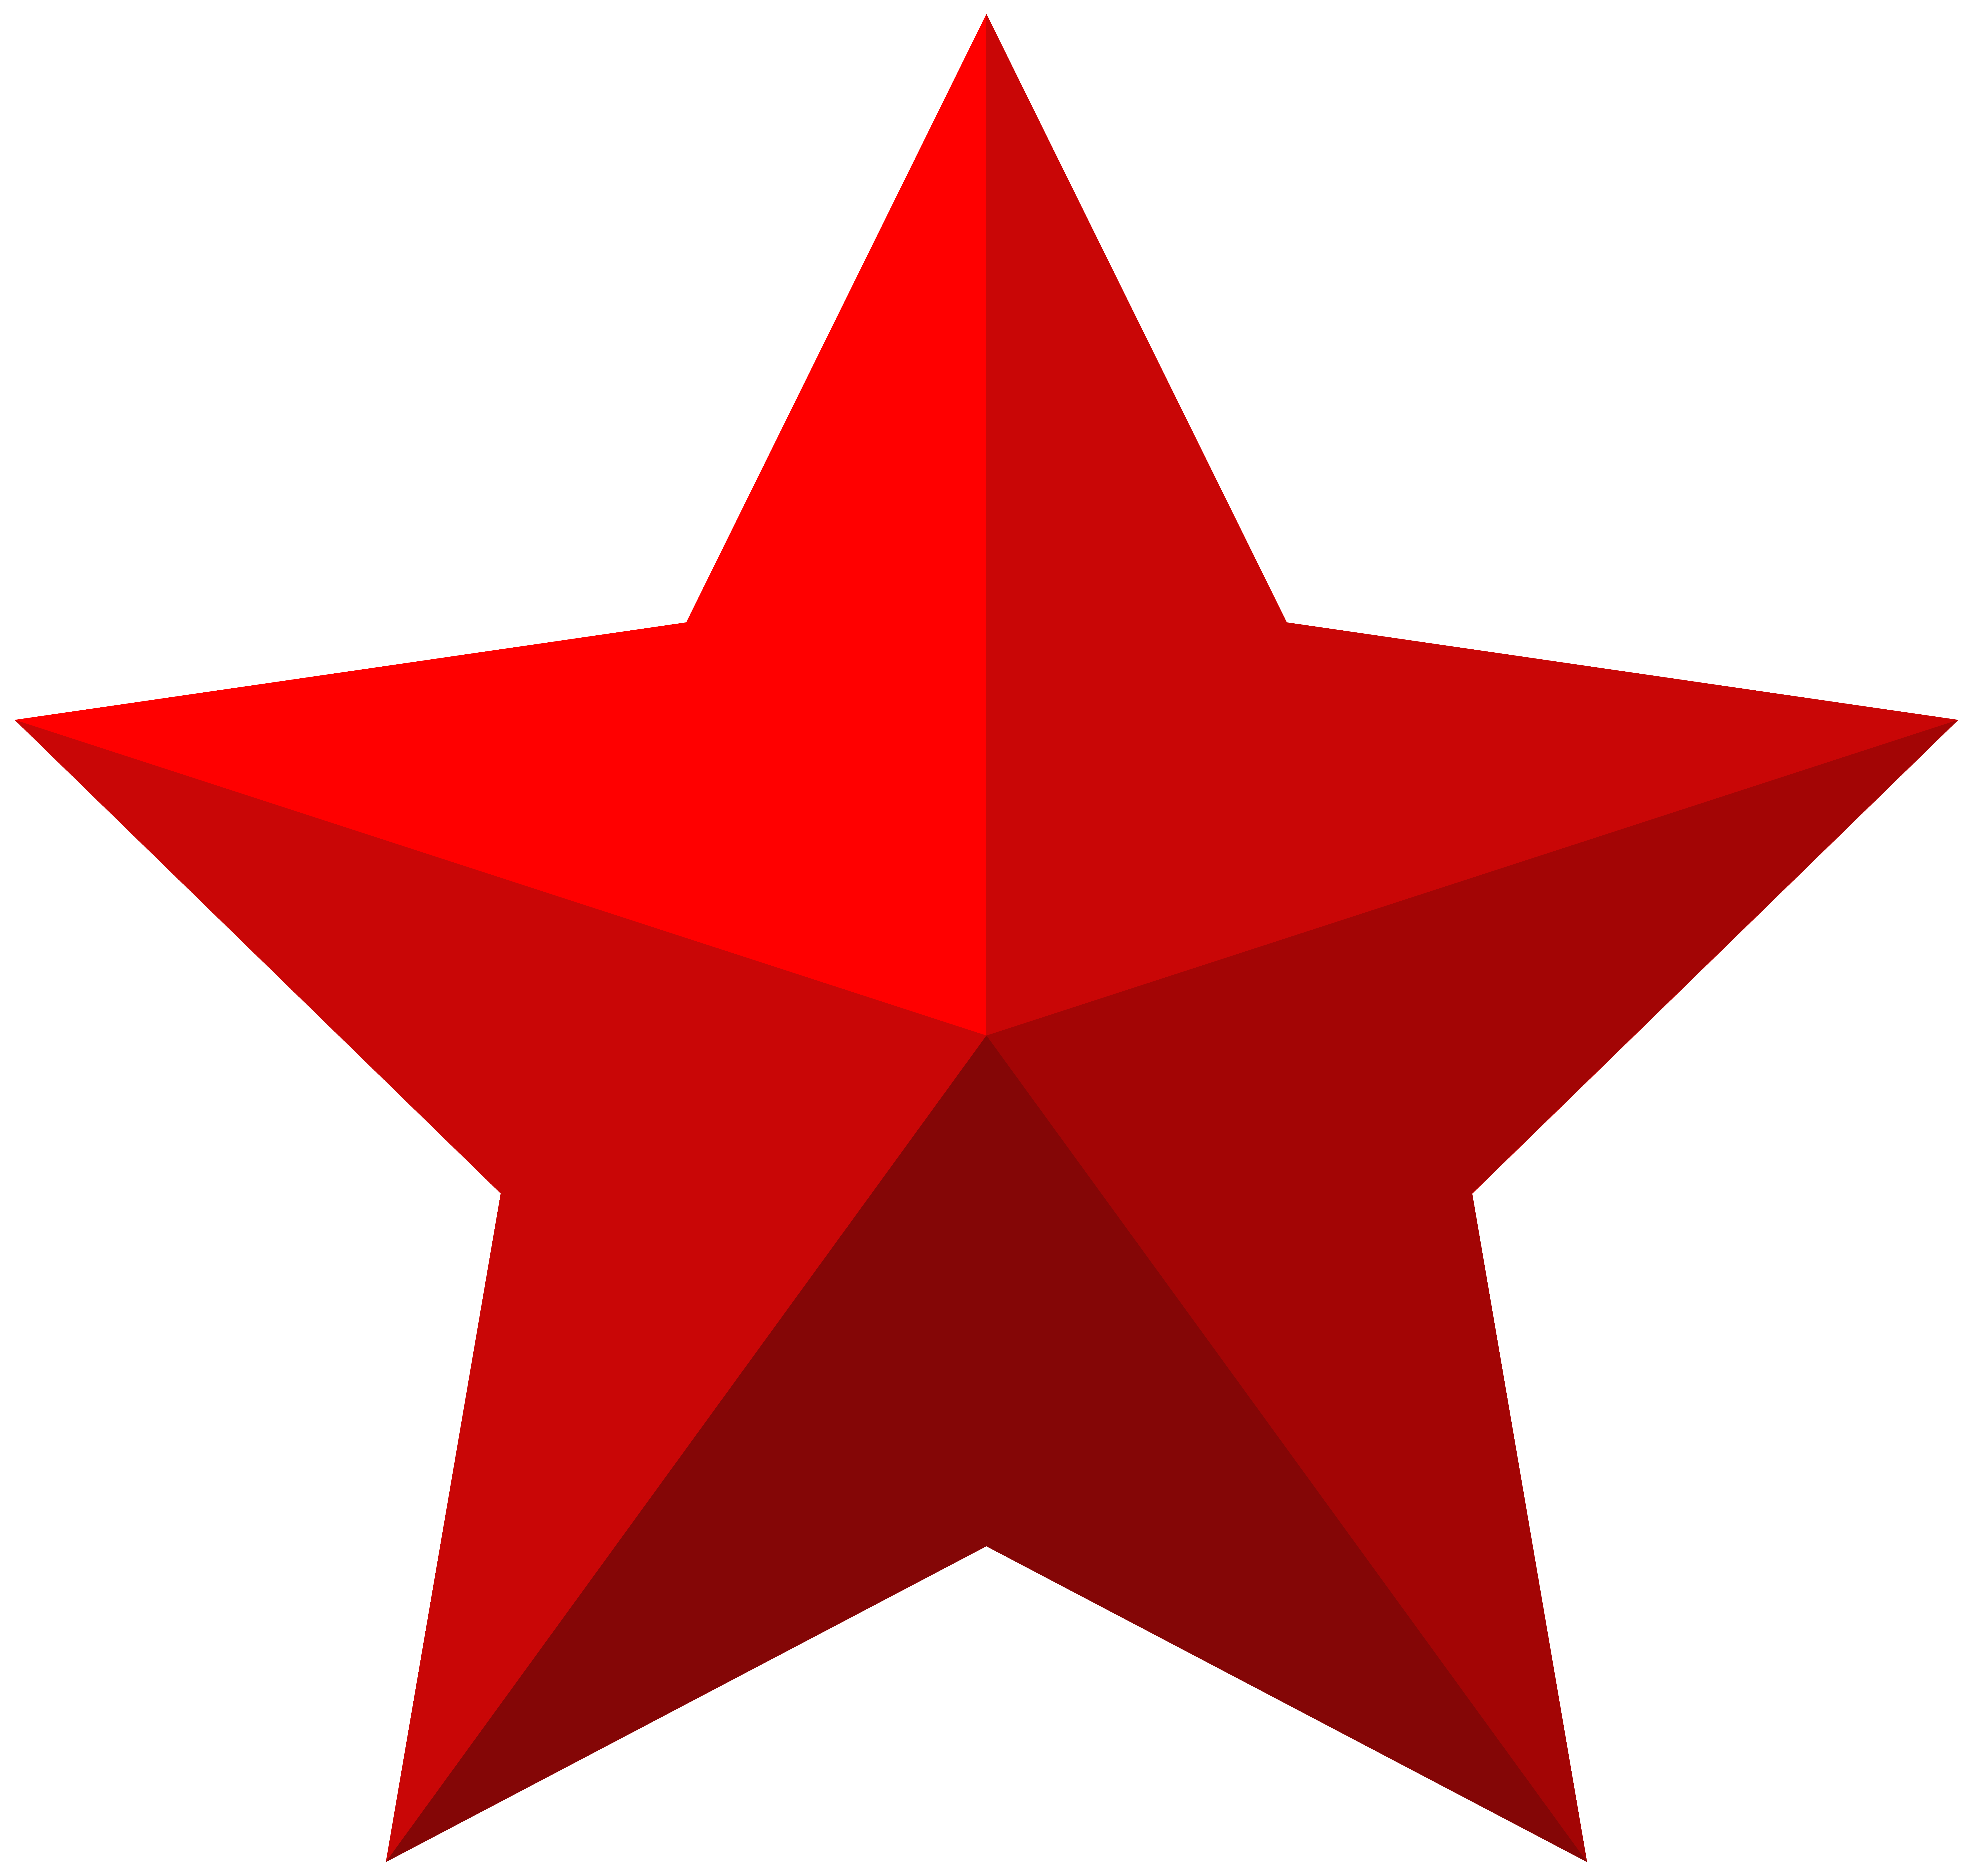 Star PNG Image File - Star PNG